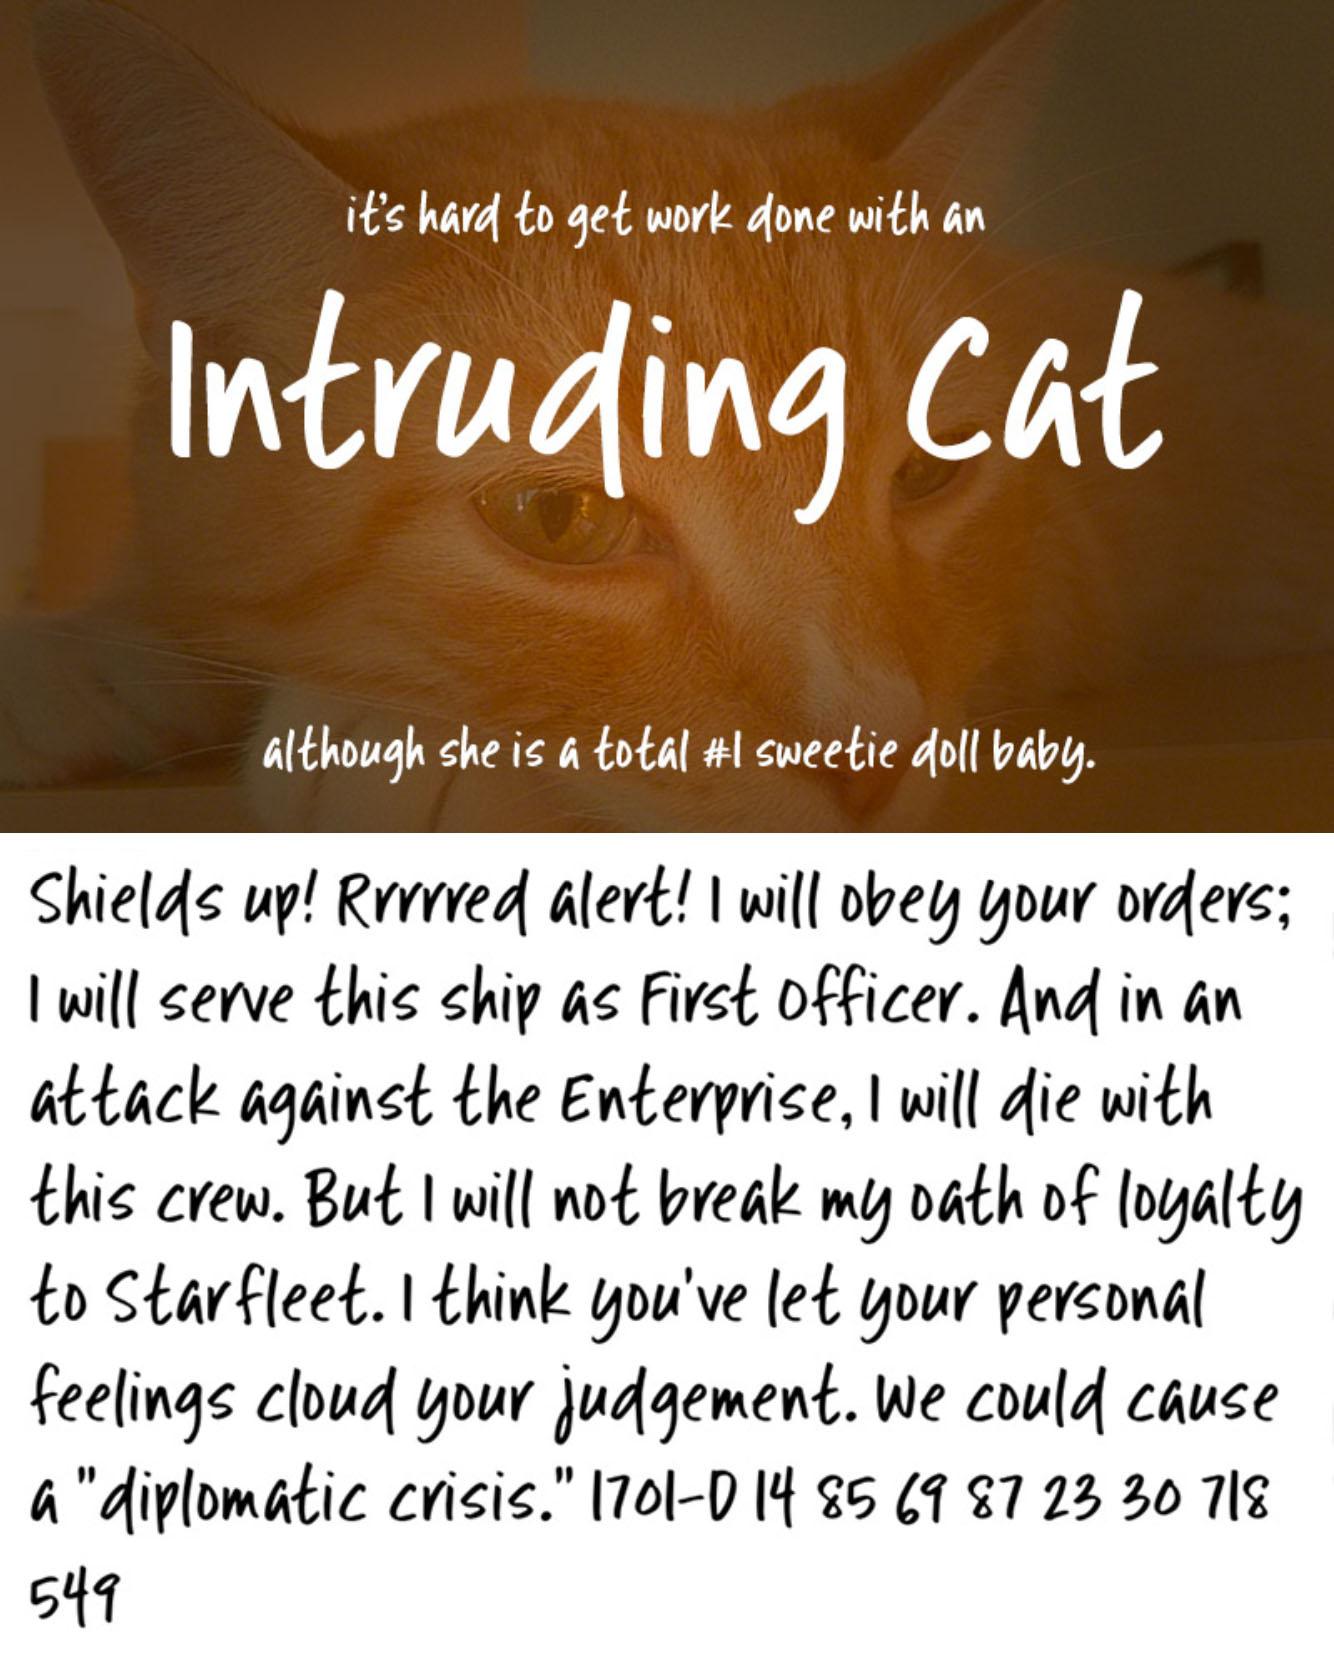 Intruding Cat